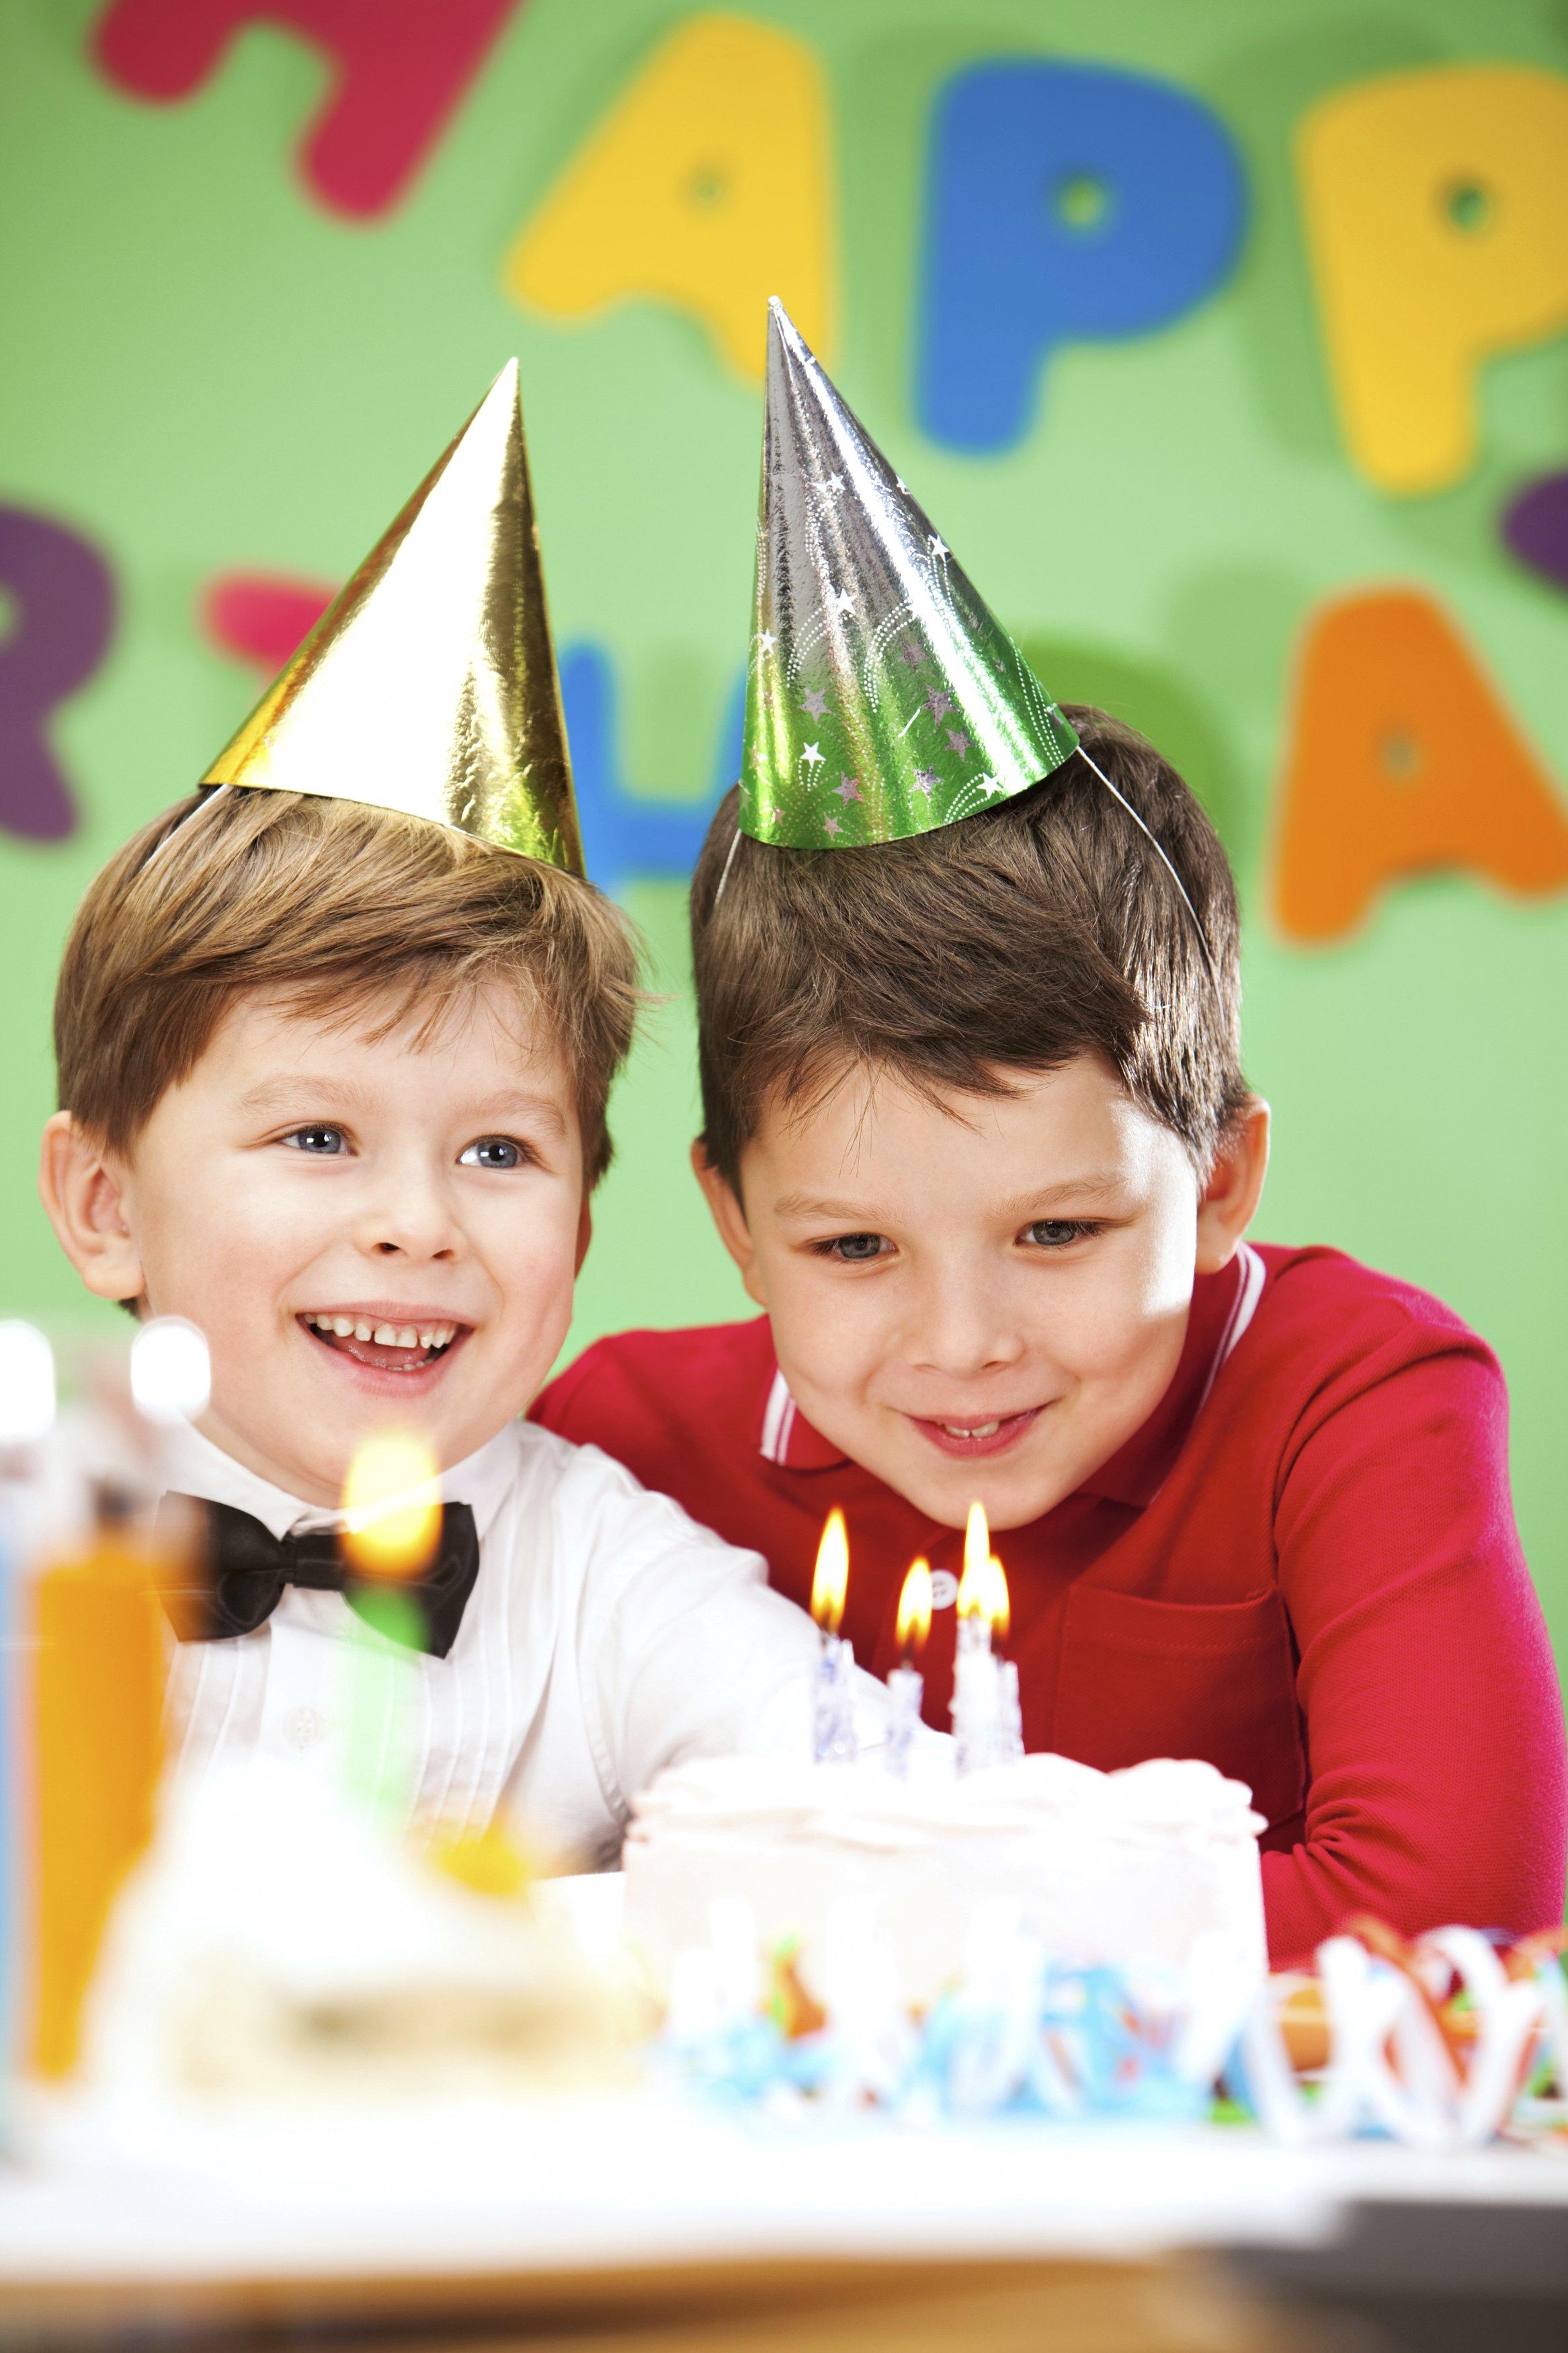 5 Disney Party Ideas: For the Boys